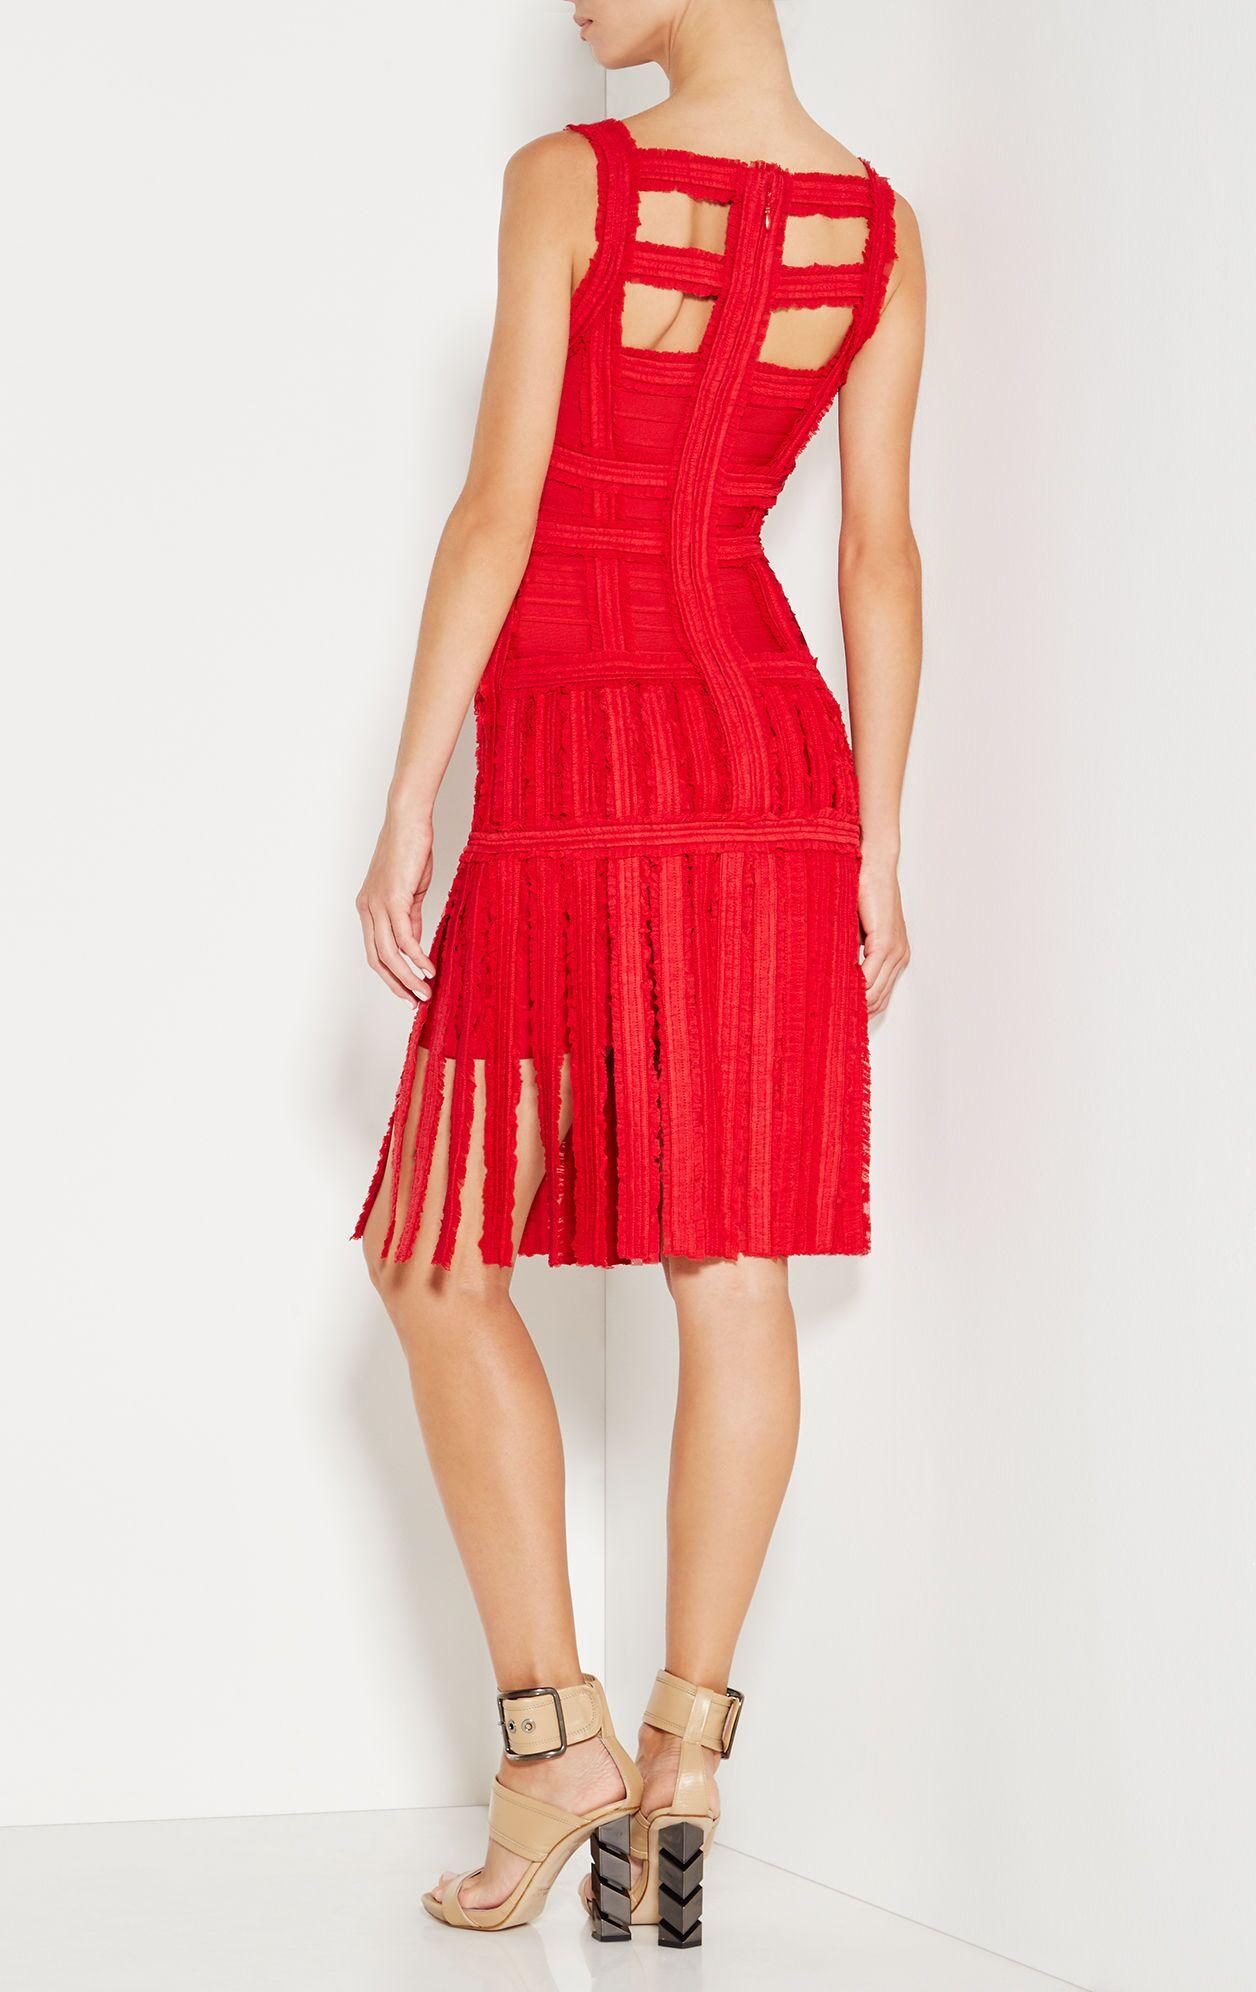 2019 hl nieuwe cocktail party clubwear night out formele fringe kwastje mouwloze chiffon sheer zwart rood wit vrouwen bandage jurk - 3